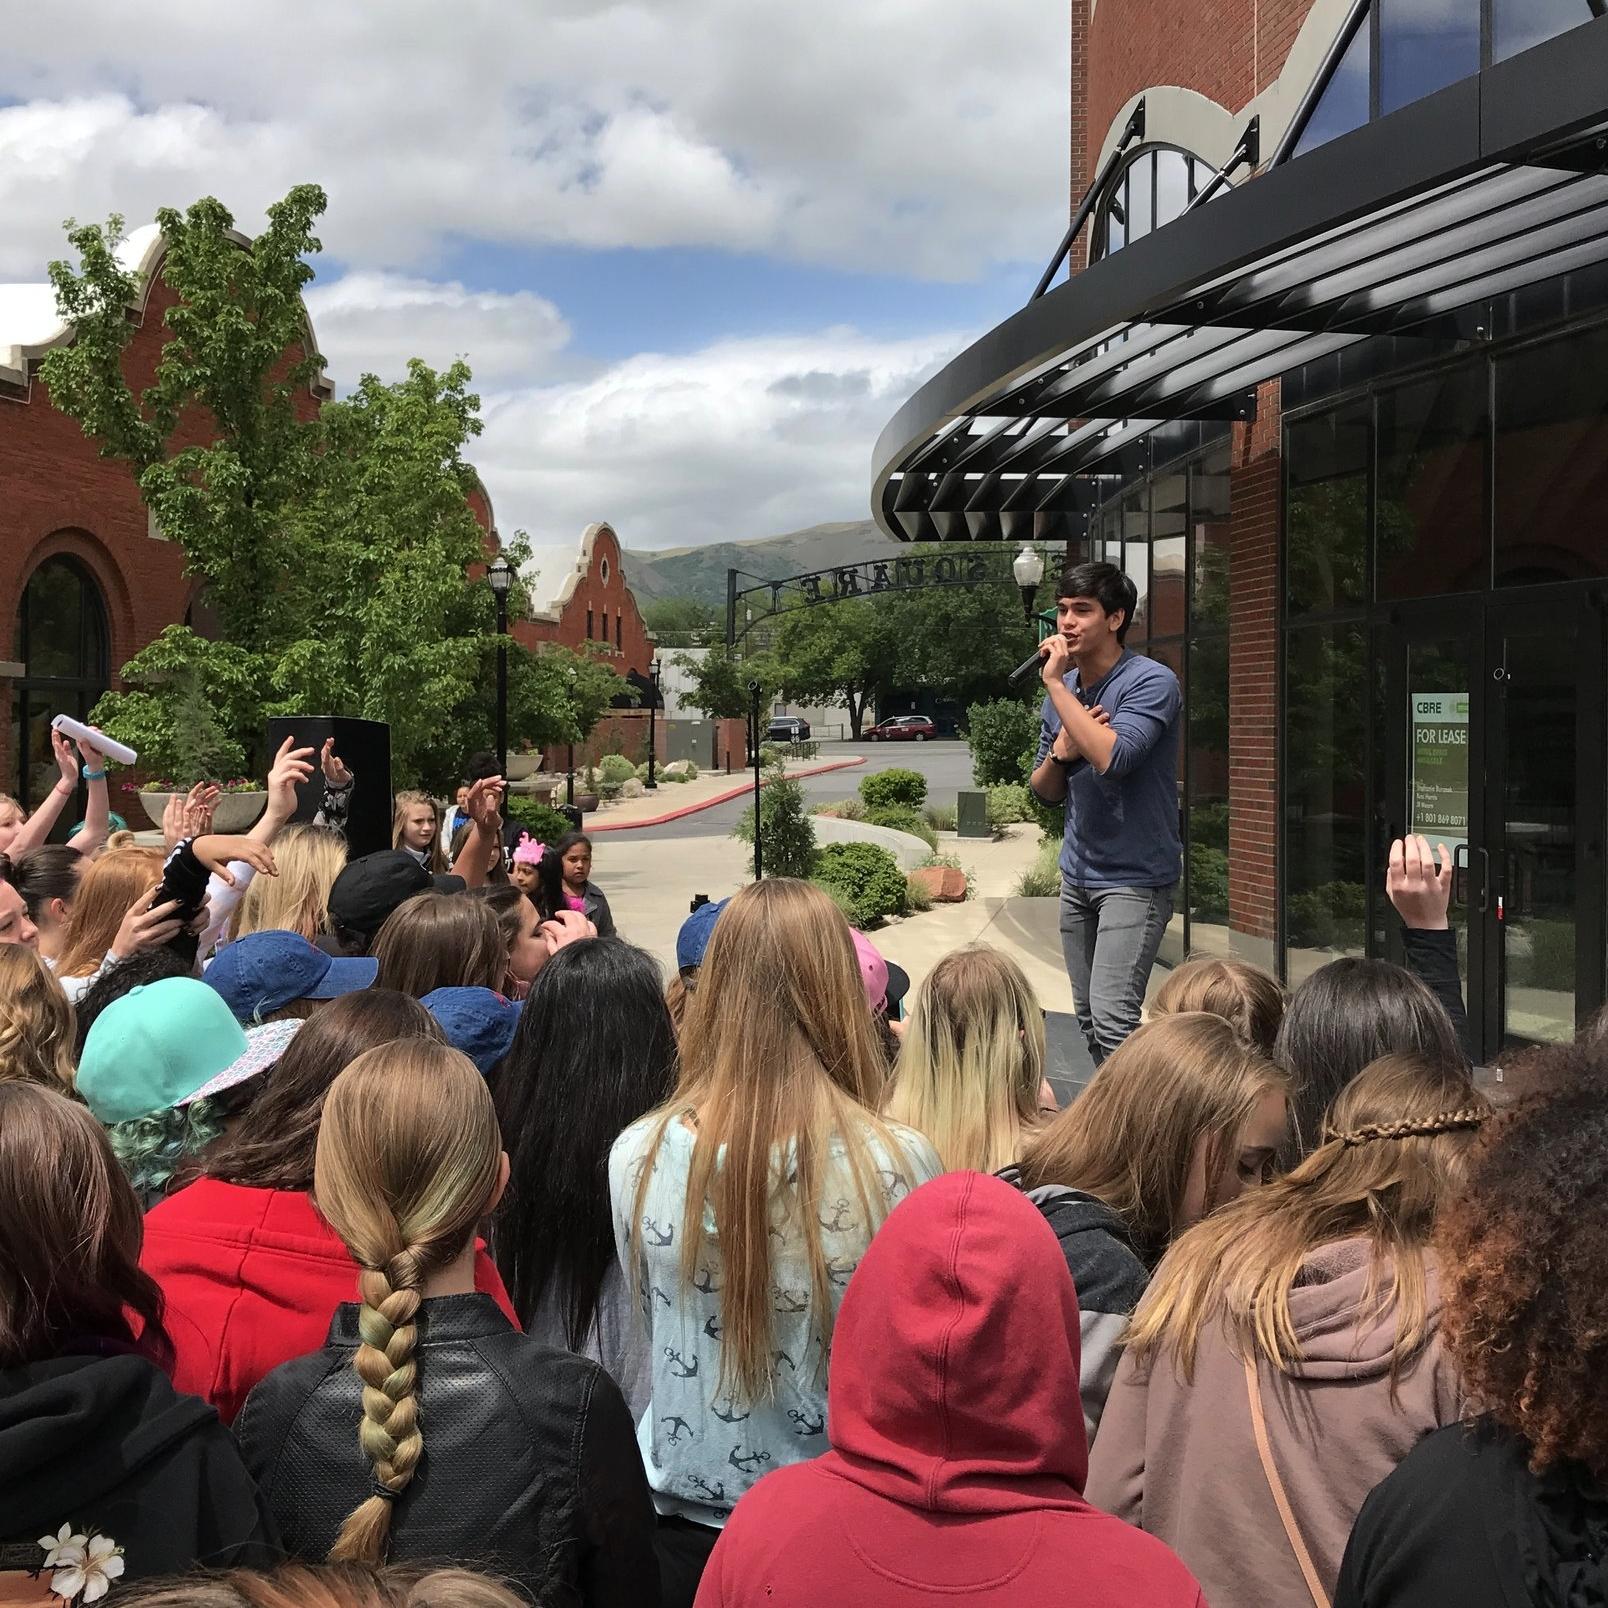 Outdoor performance in Salt Lake City, UT